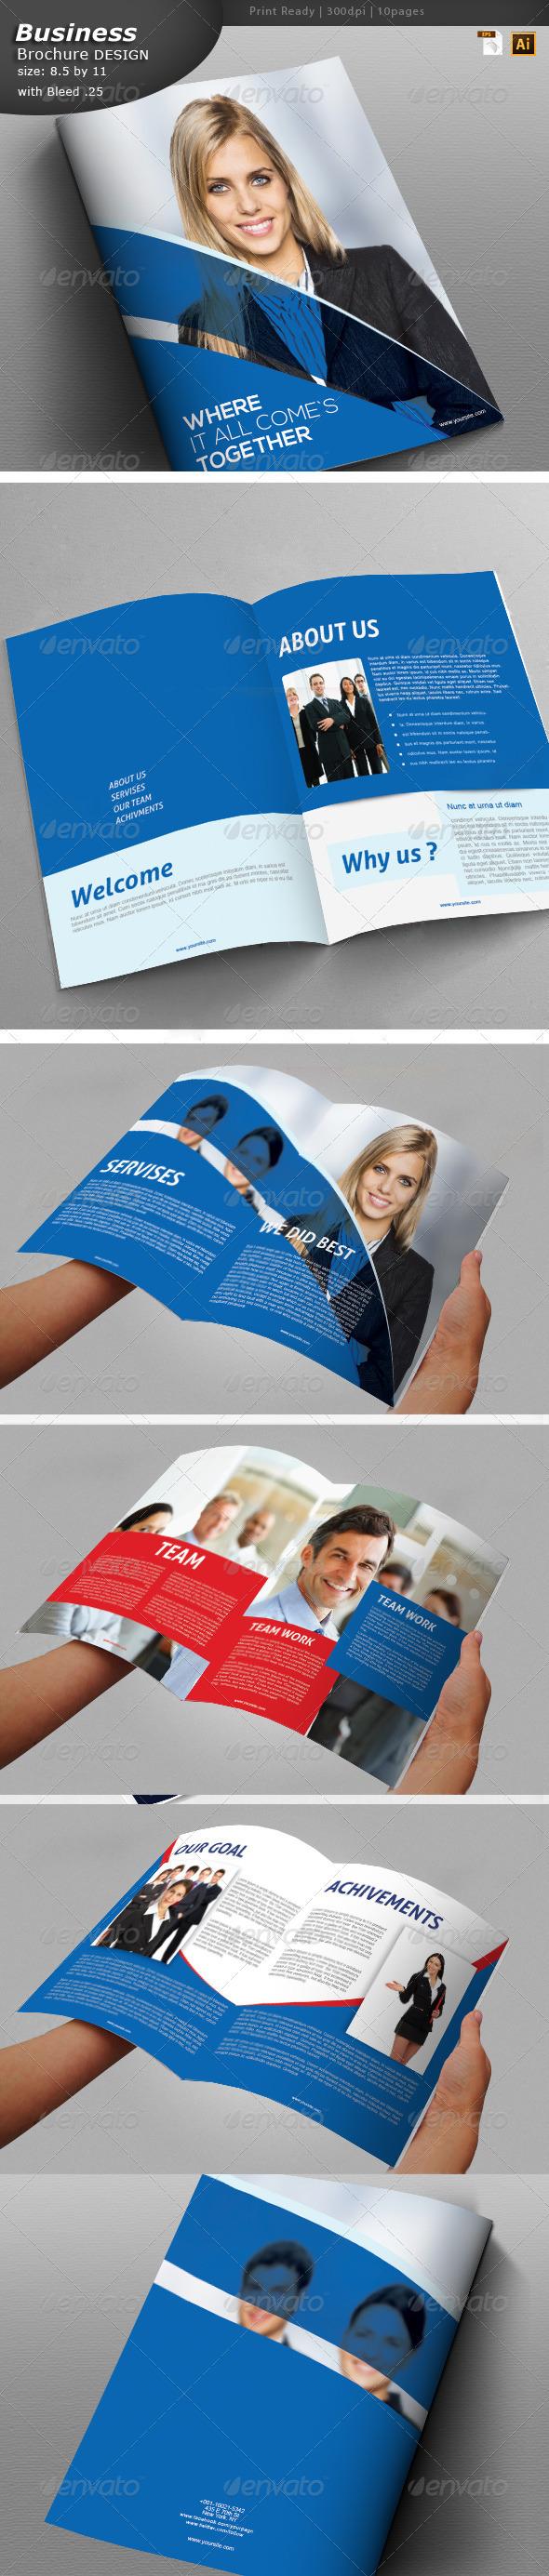 Consulting Brochure Design  - Brochures Print Templates